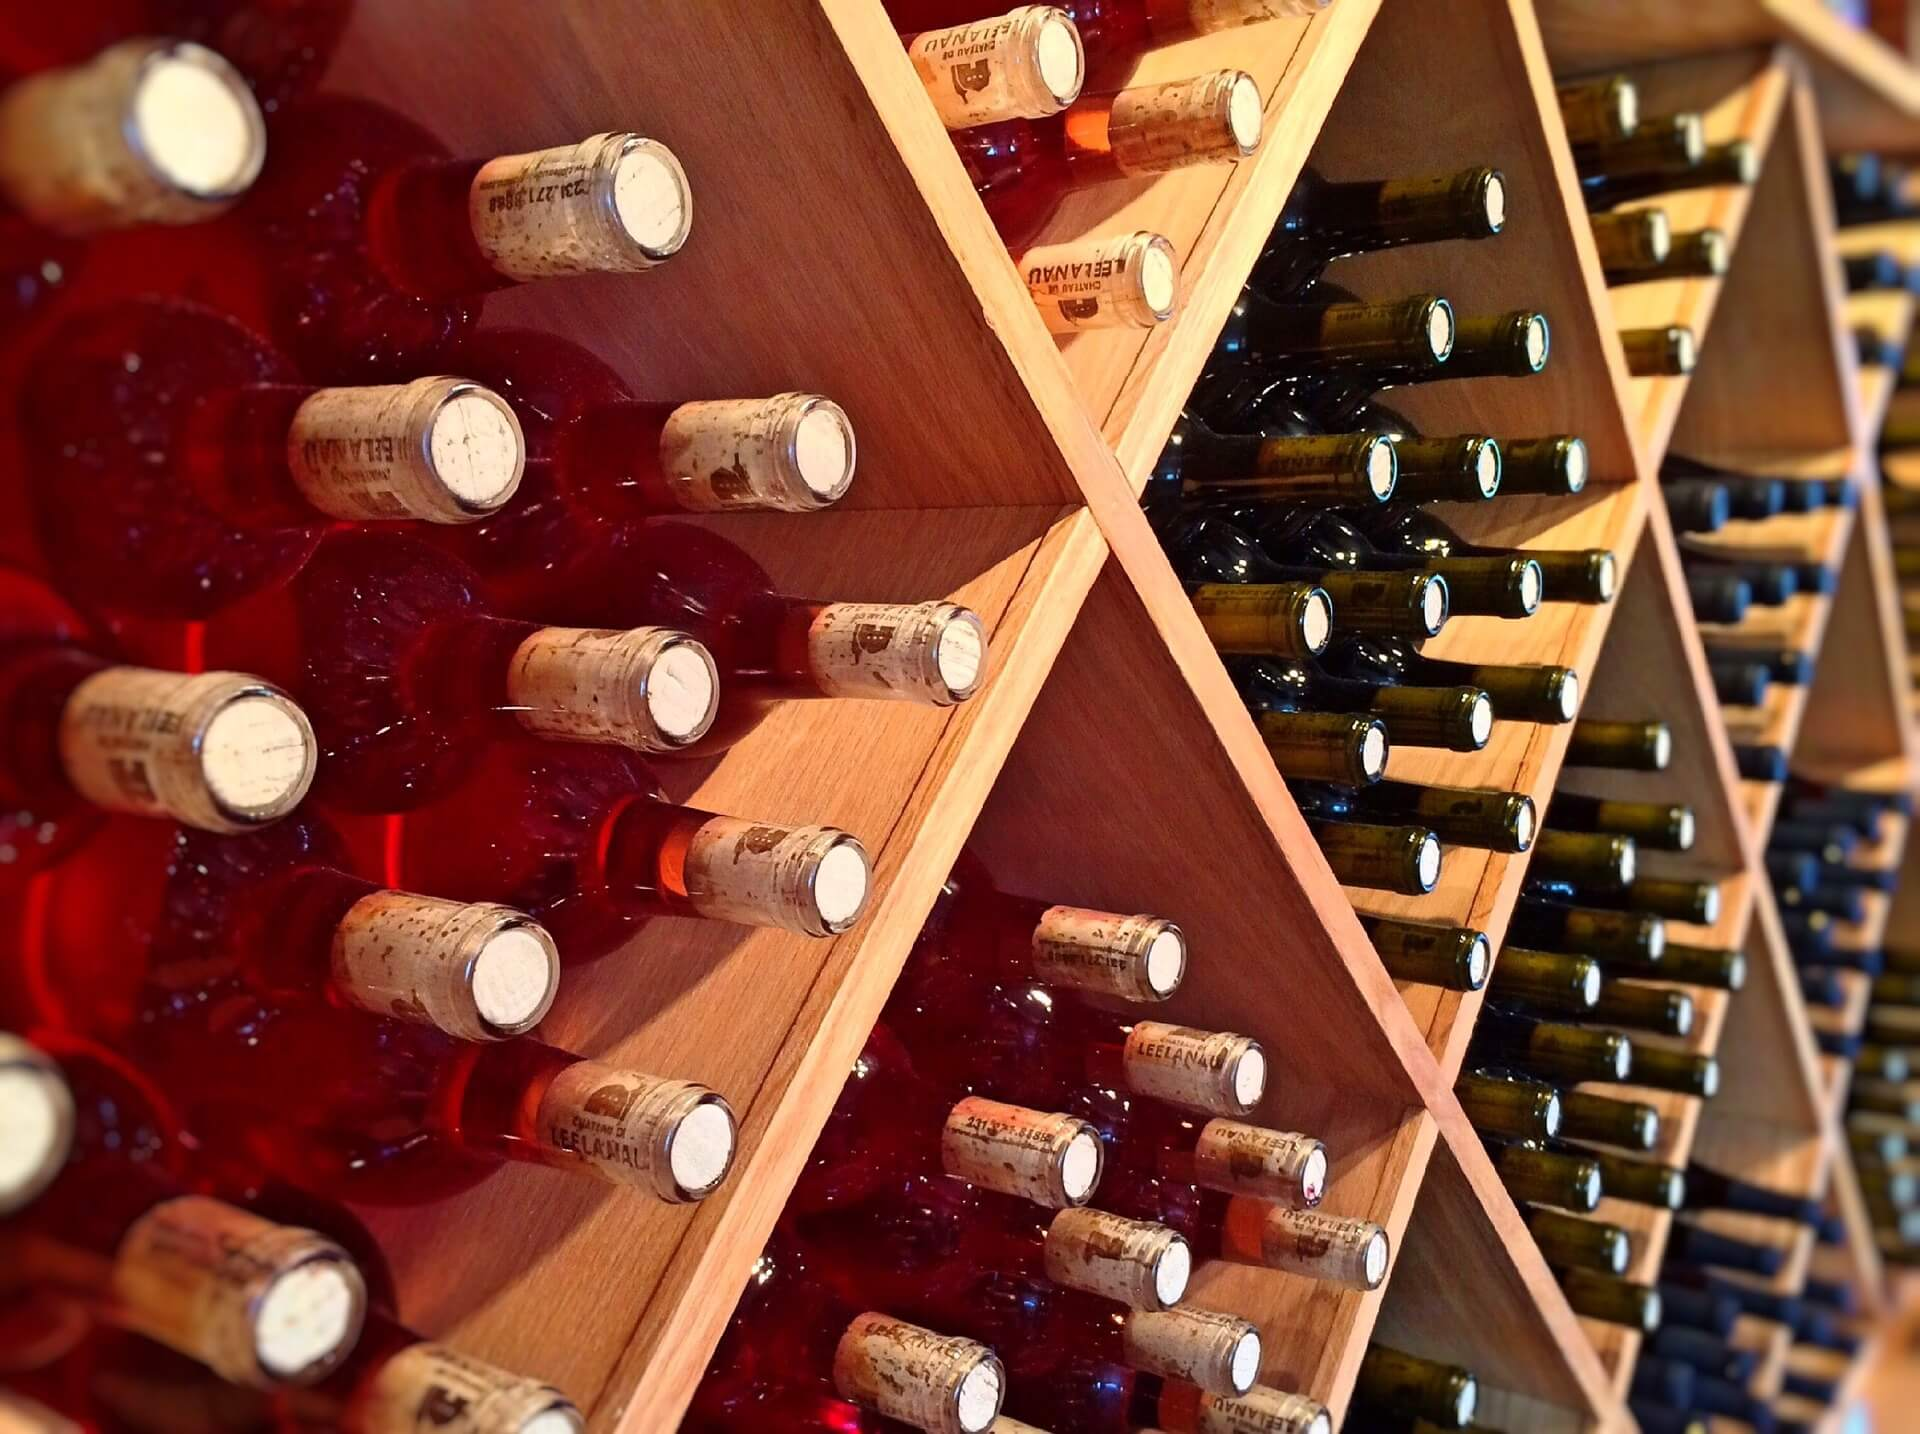 dtc wine shipments